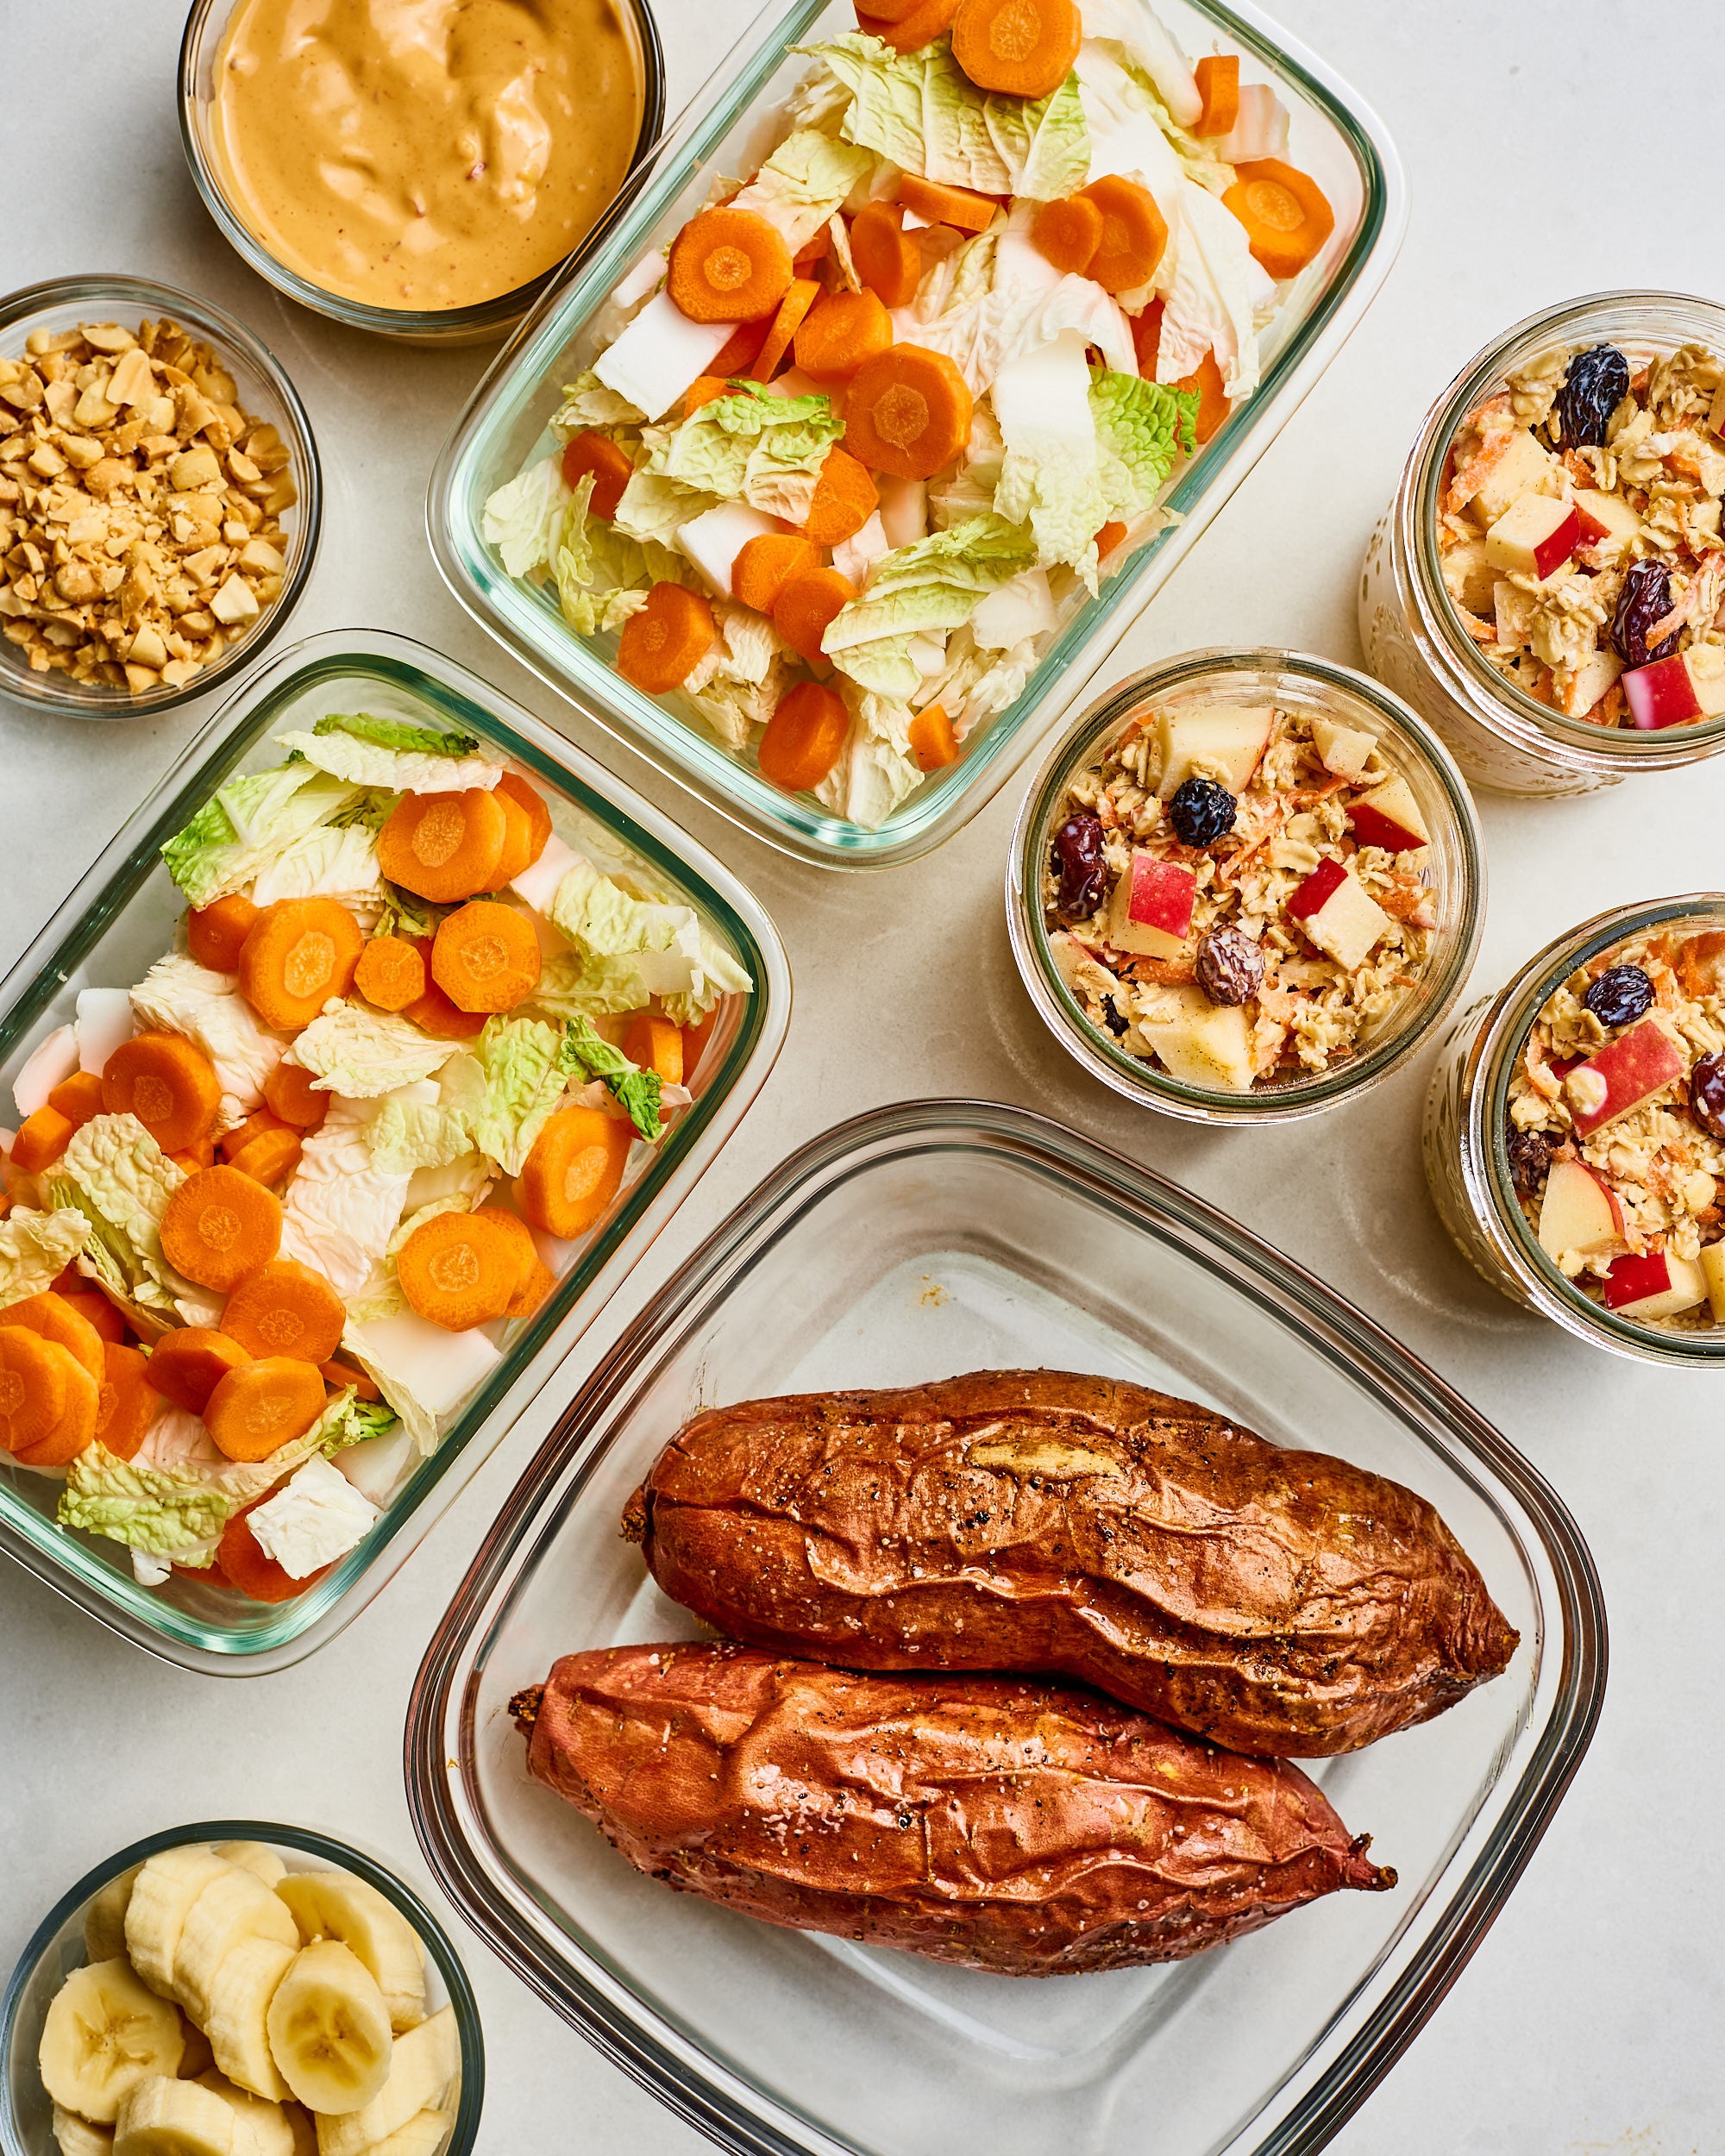 Easy Vegan Meal Prep Plan | Kitchn